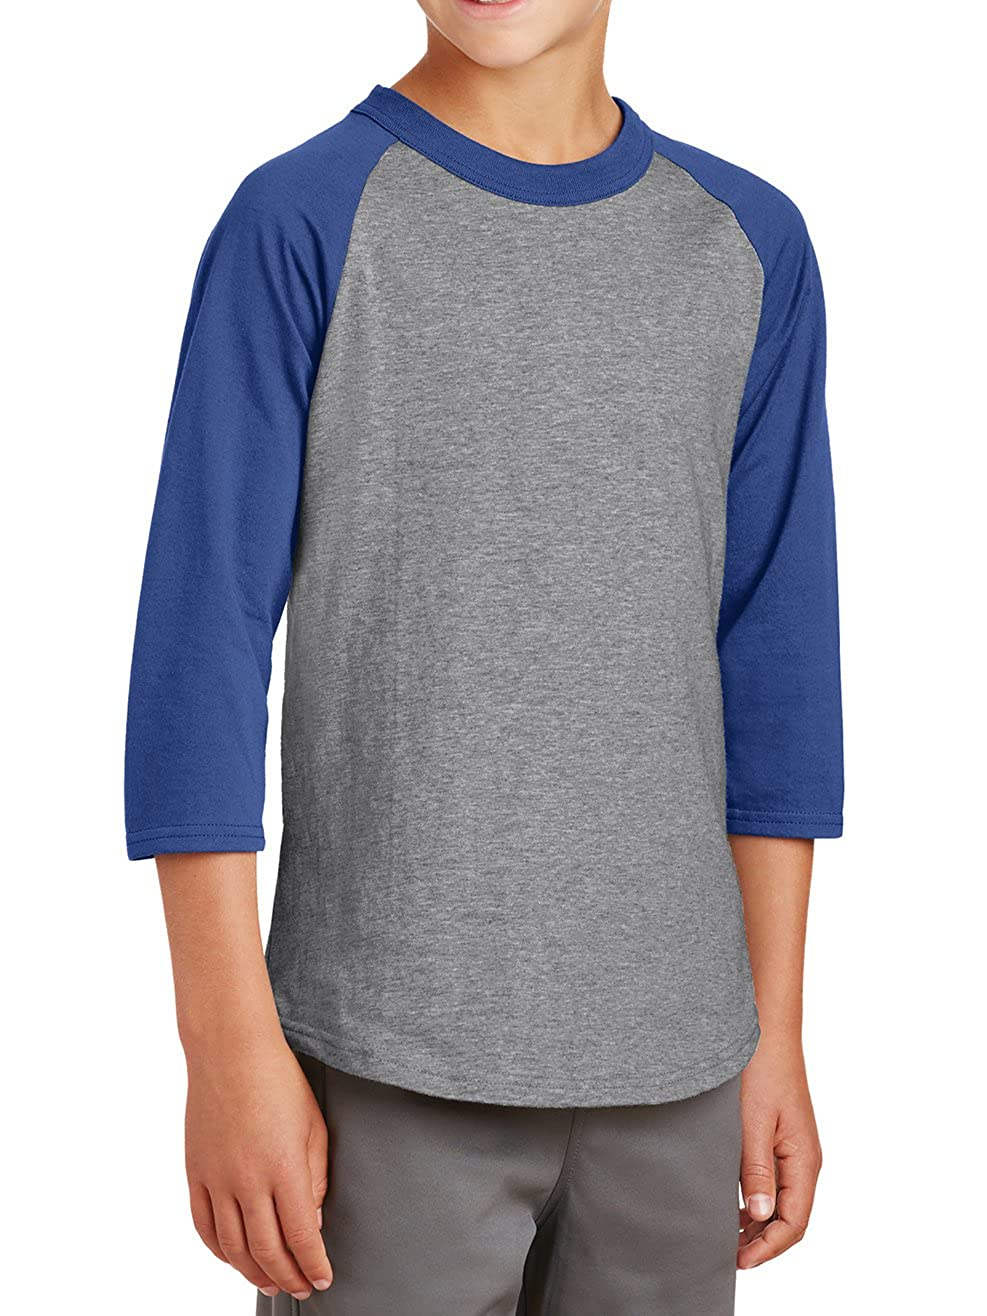 Mafoose Youth 3/4 Sleeves Colorblock Raglan Baseball Soft Jersey